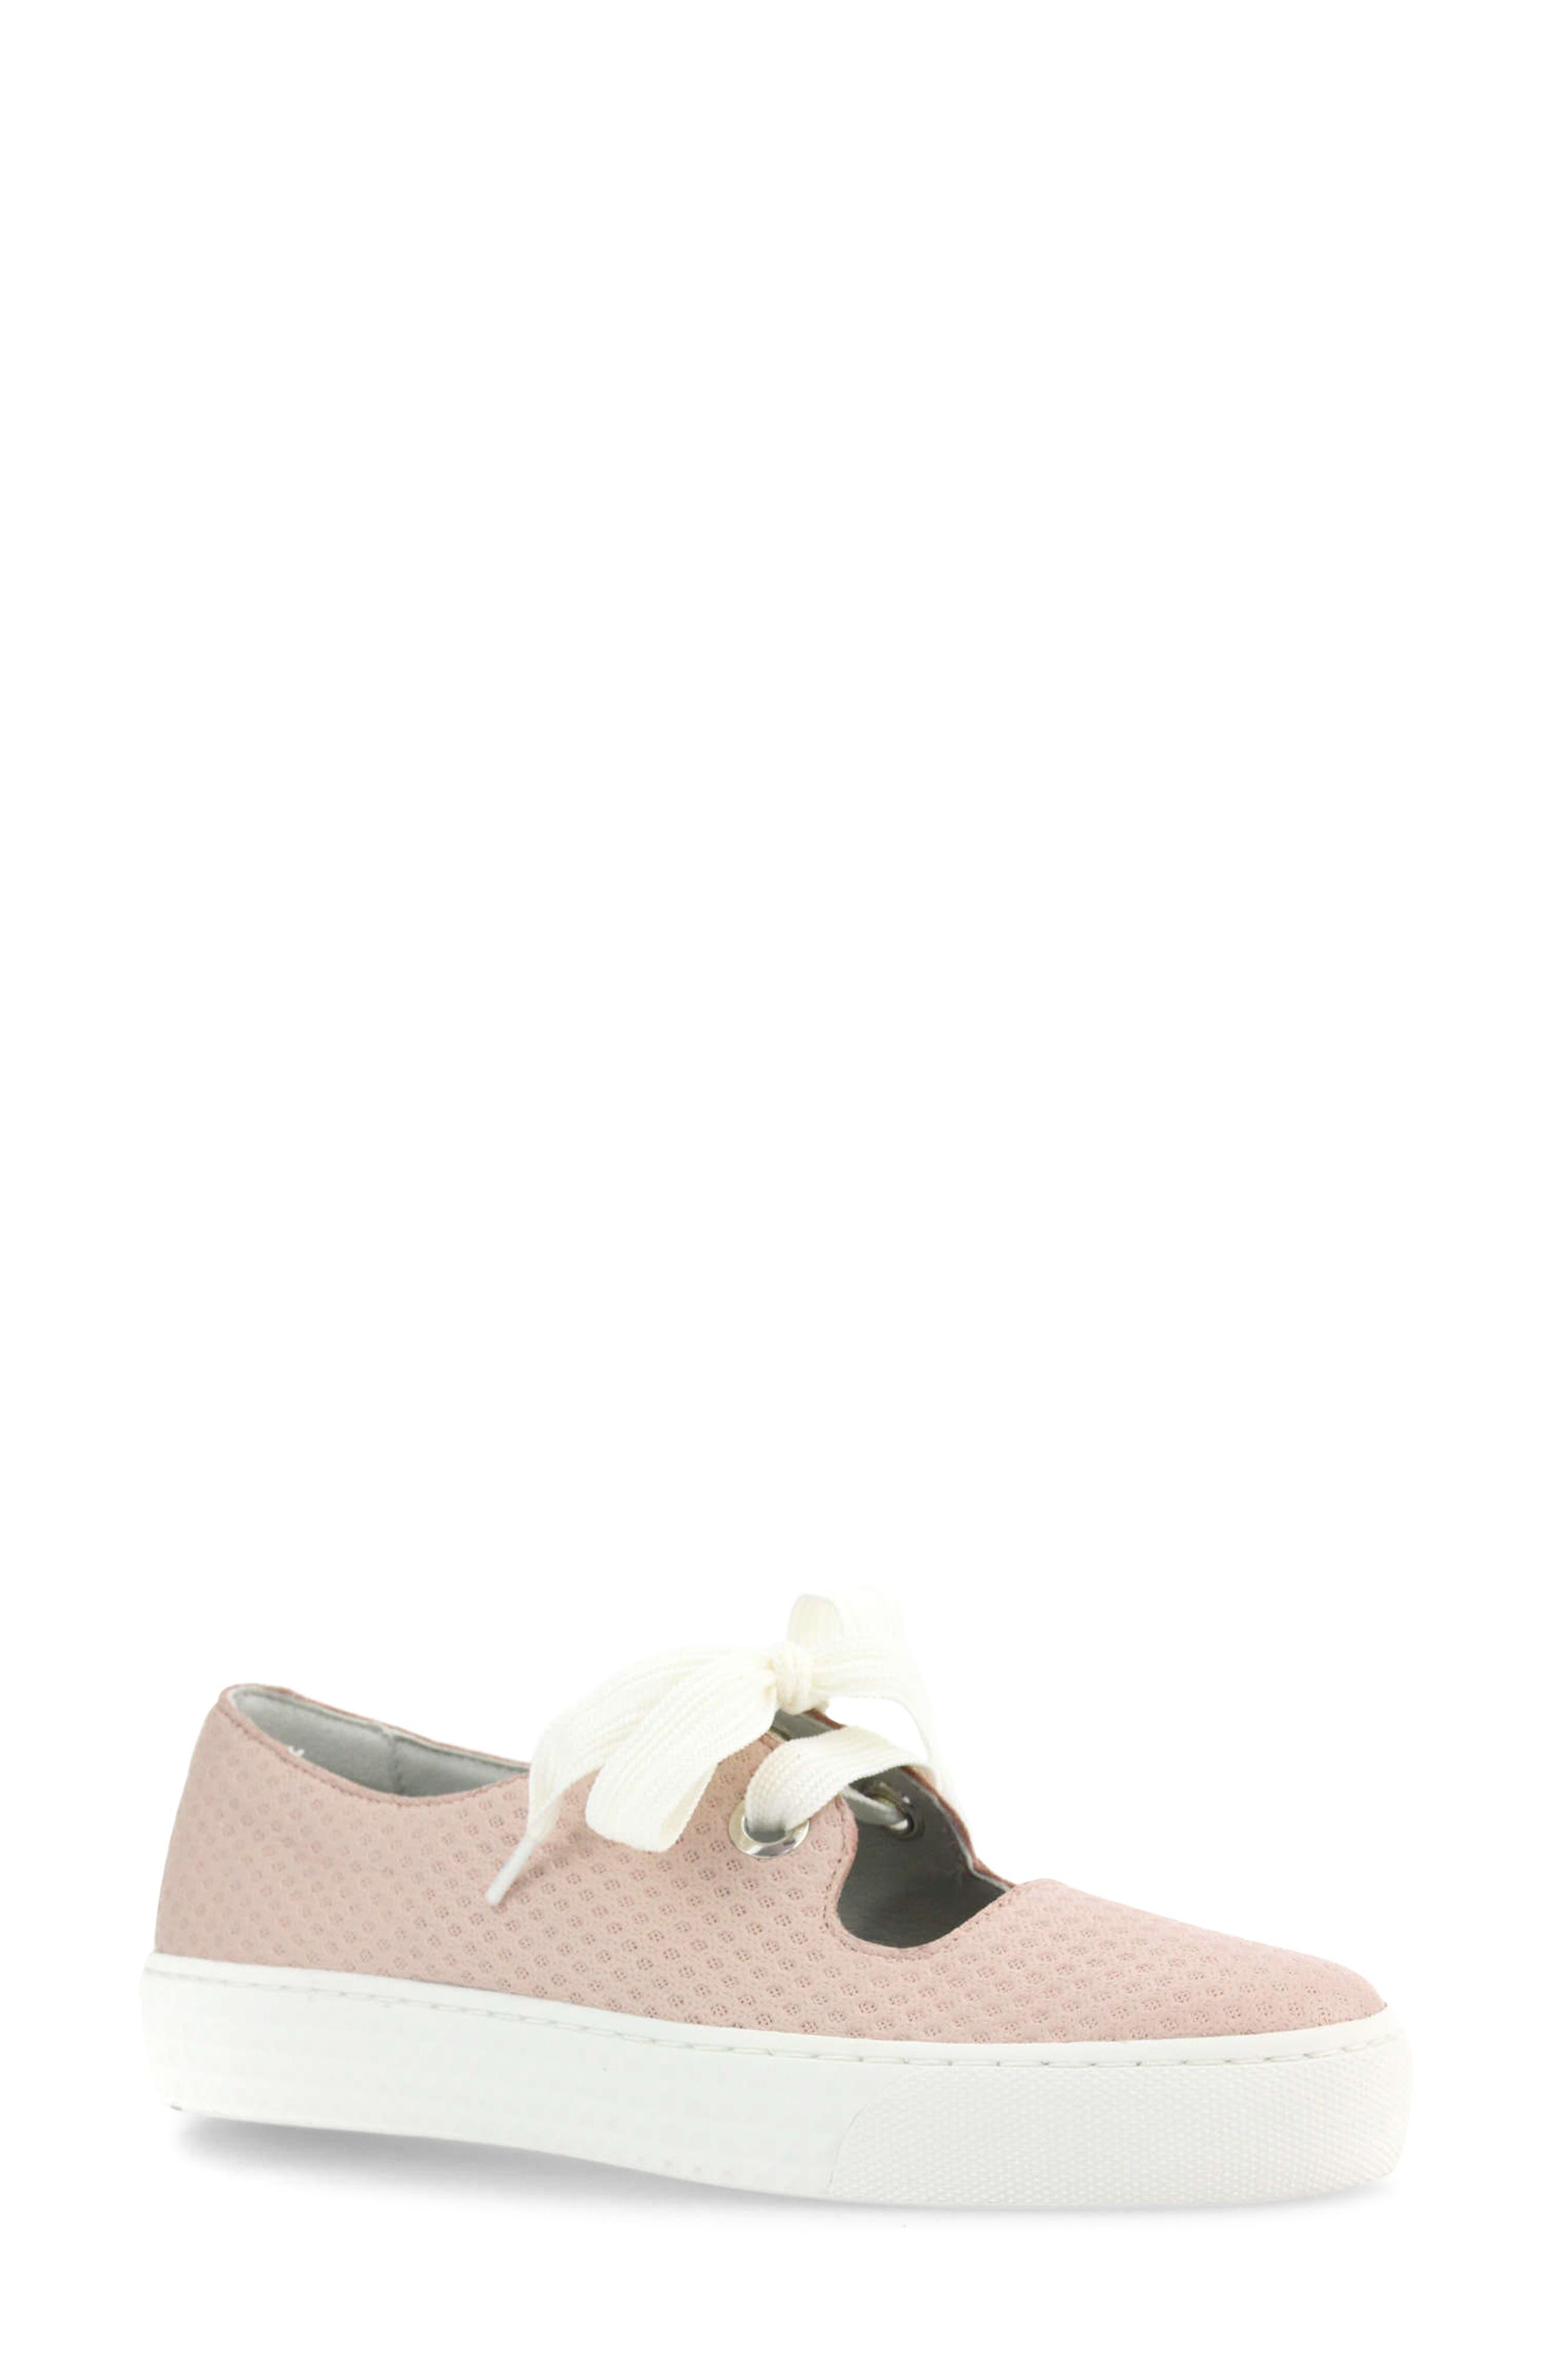 Uzuri Mary Jane Sneaker